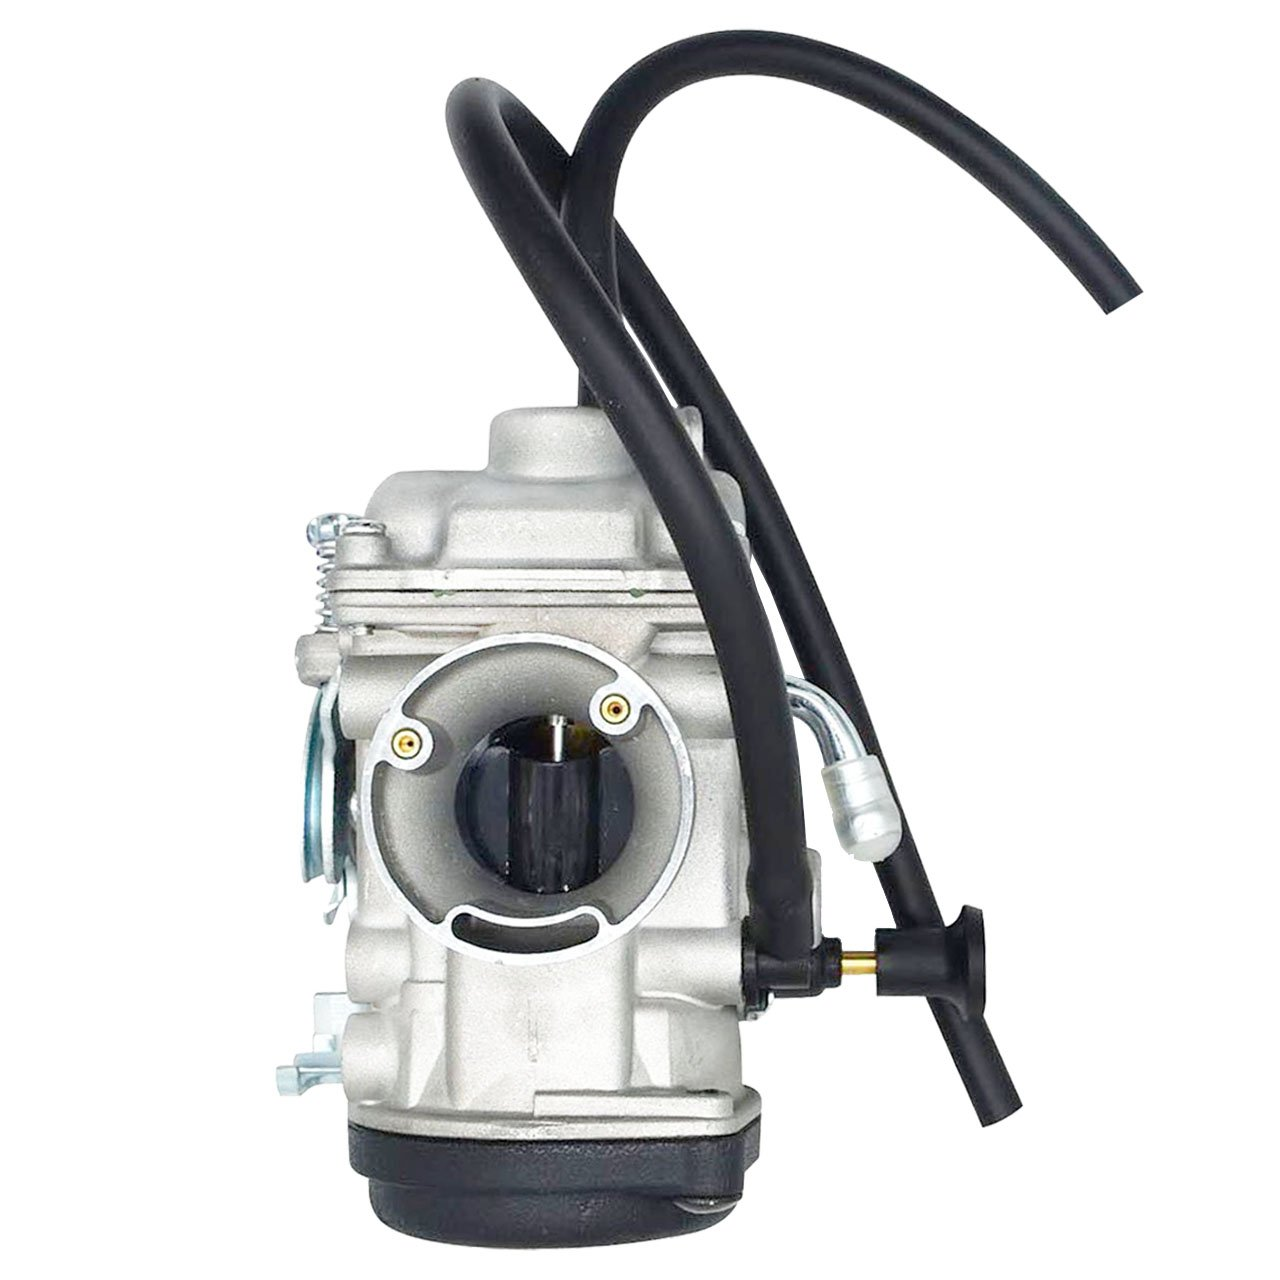 FYIYI New TW200 Carburetor For YAMAHA TW200 TW 200 2001-2017 200 Trailway Carb